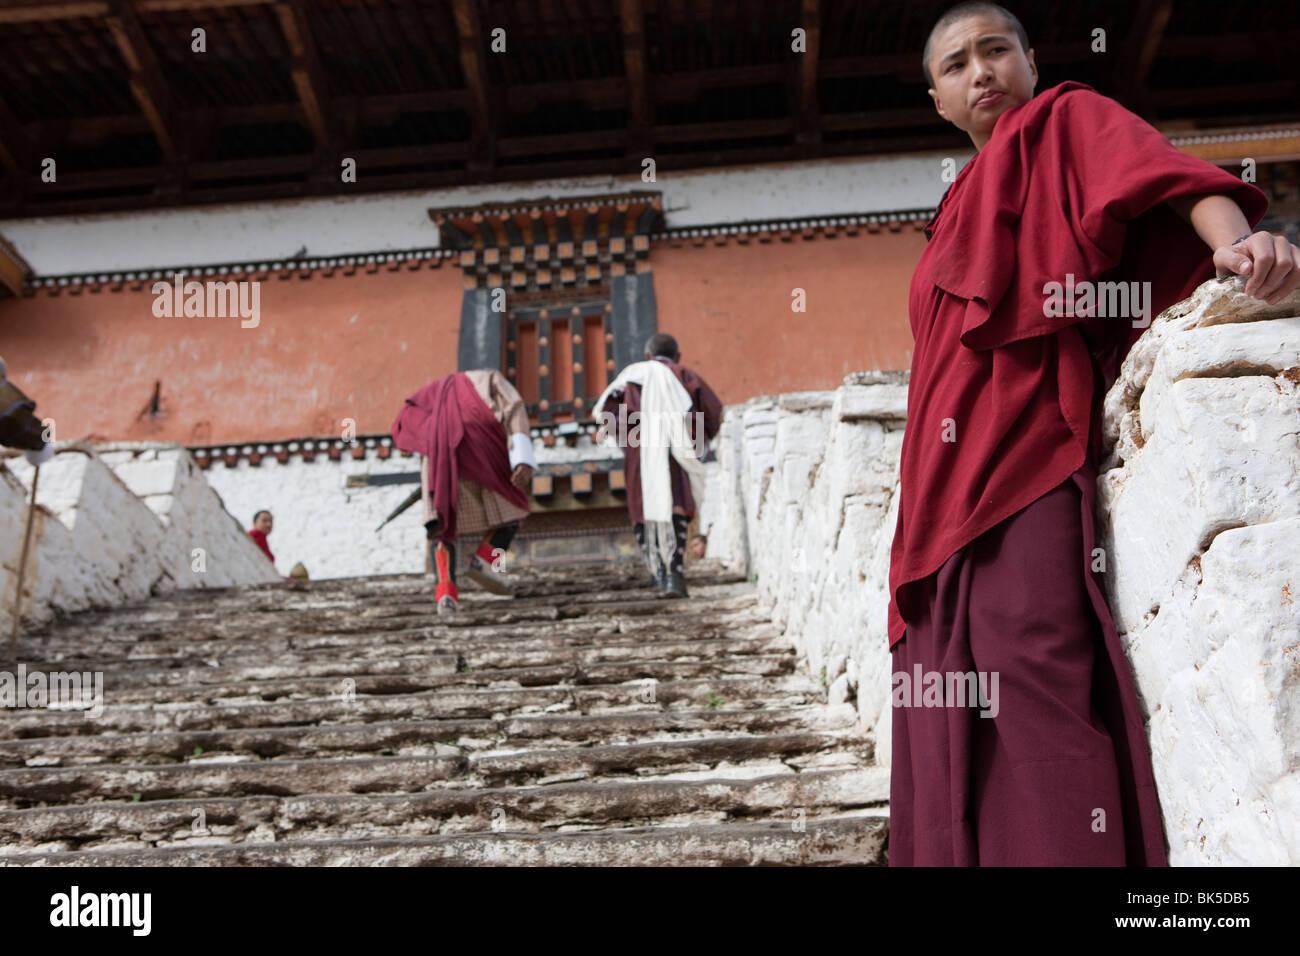 Monks in a monastery in Bhutan - Stock Image